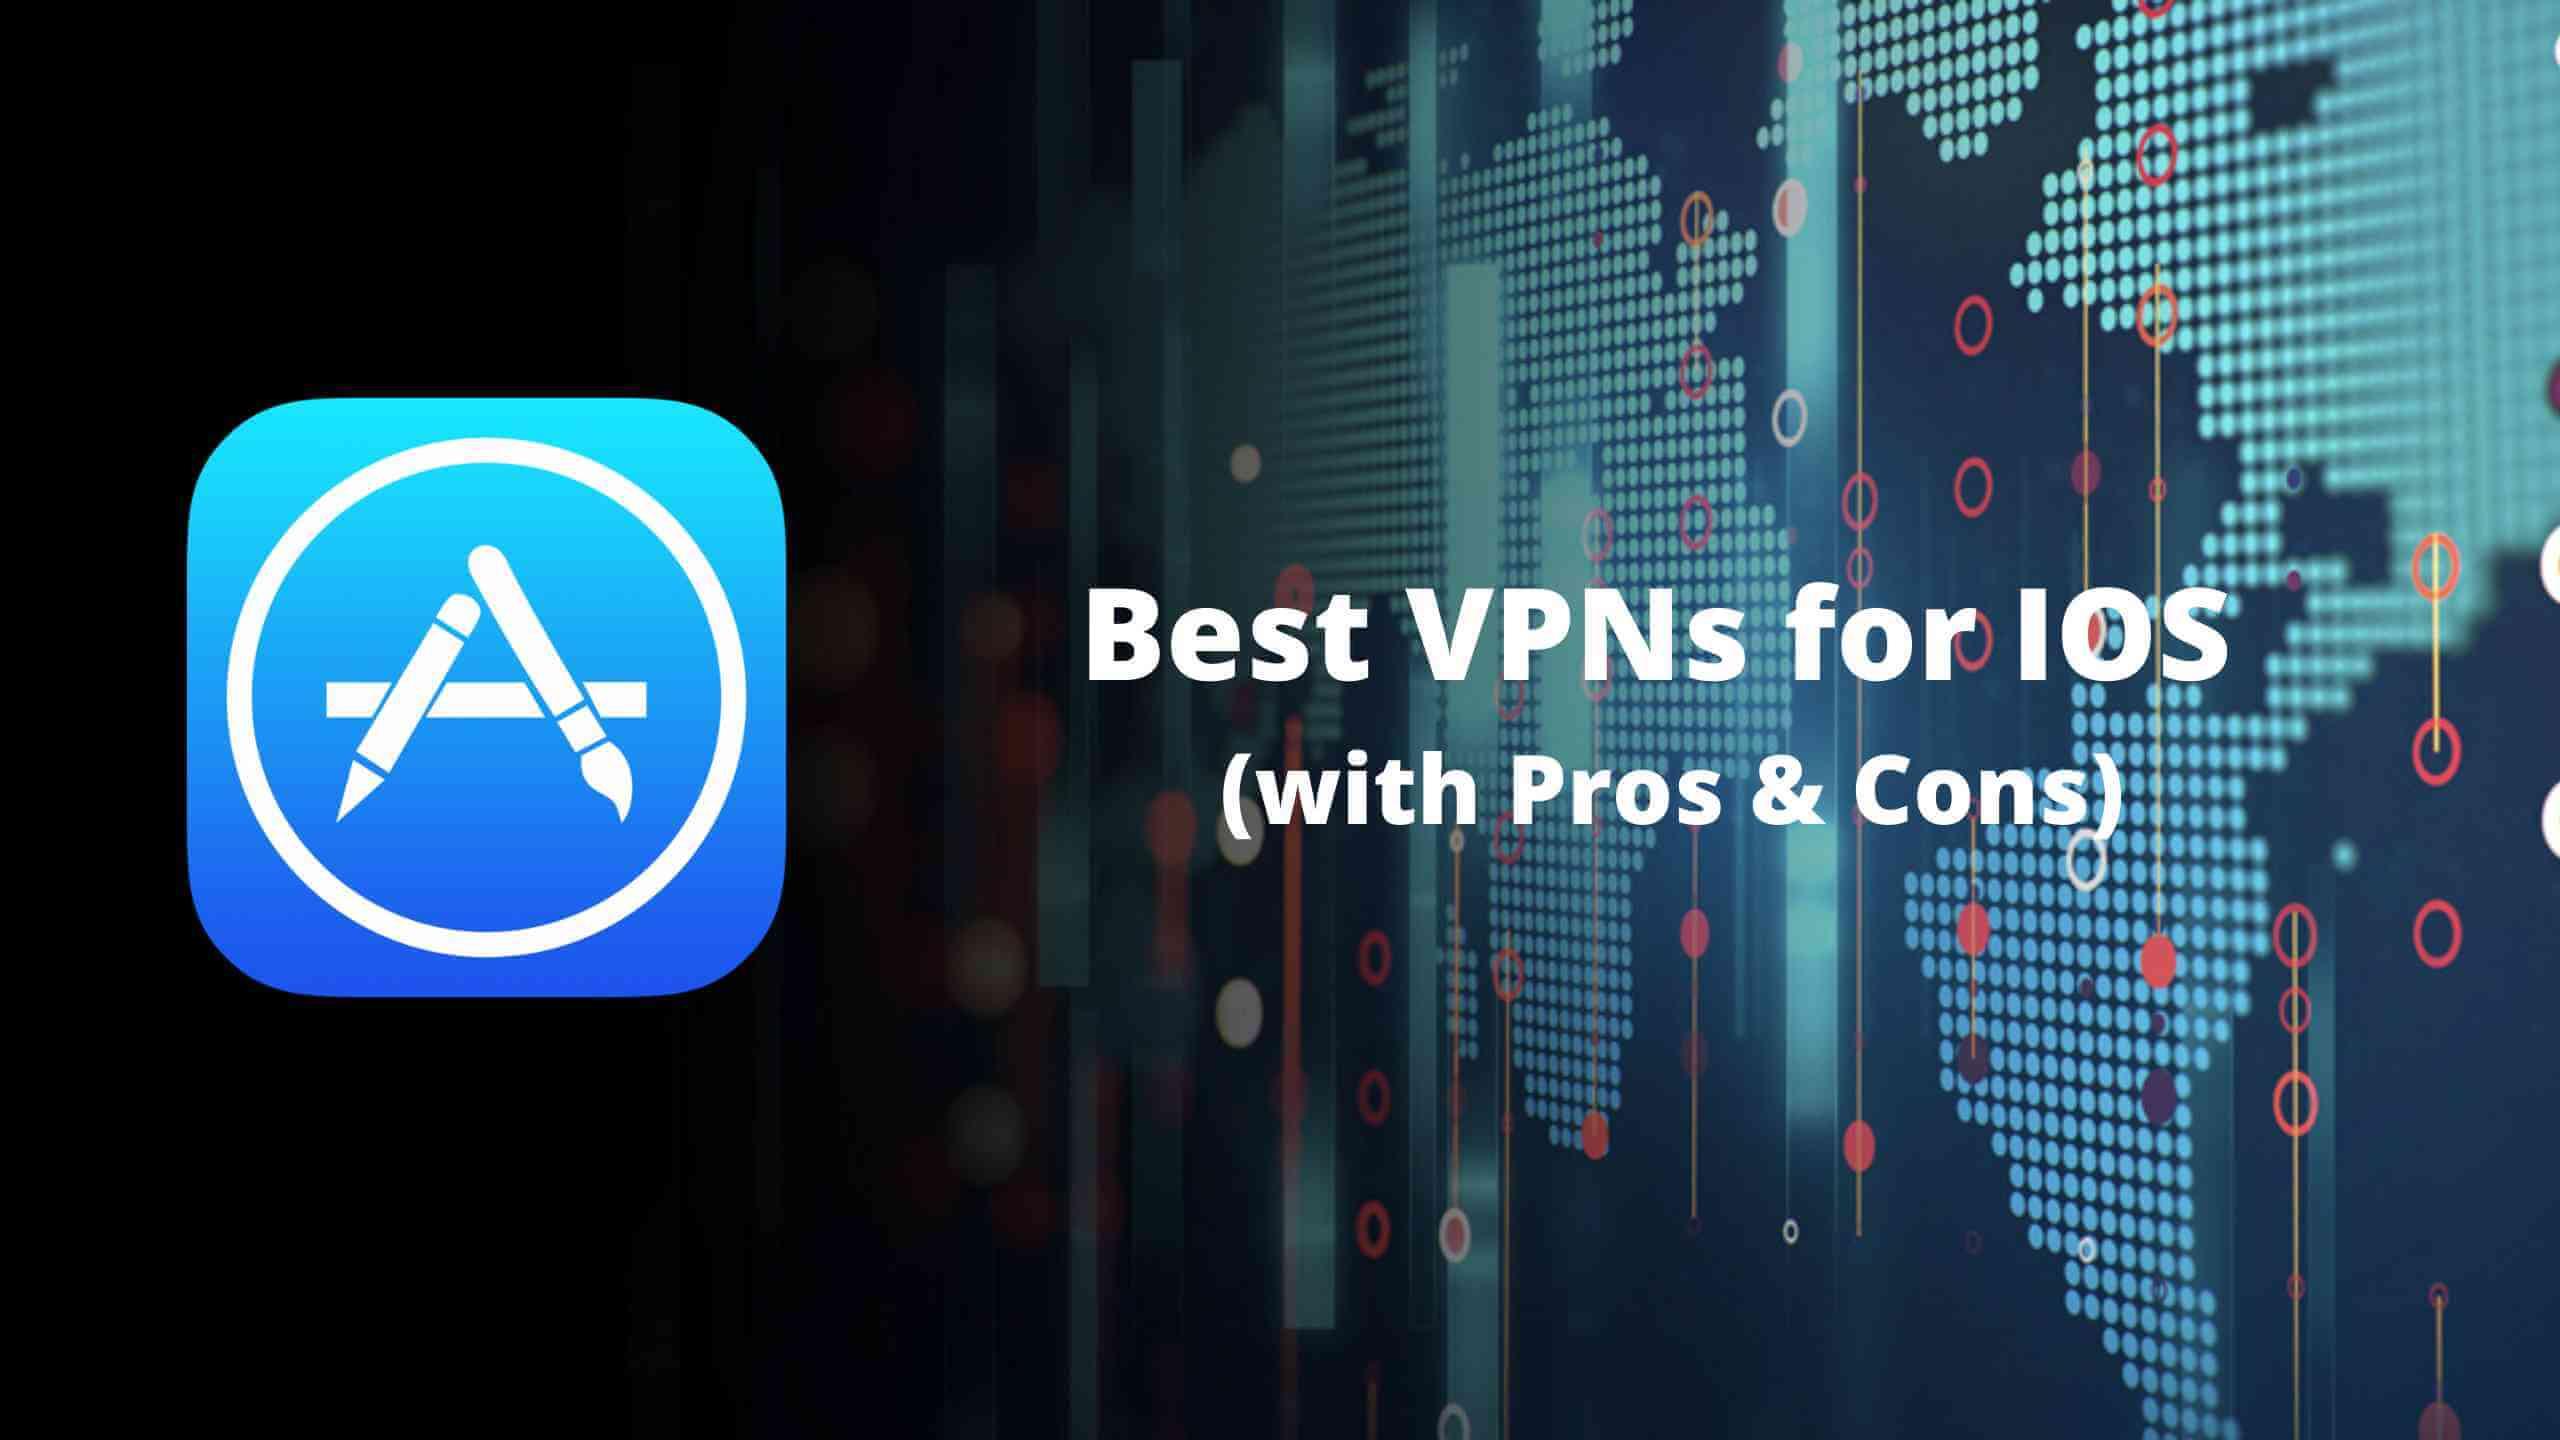 best vpn for IOS, best vpns for ios, best vpn for iphone, best vpns iphone, best vpns IOS, ios VPNs